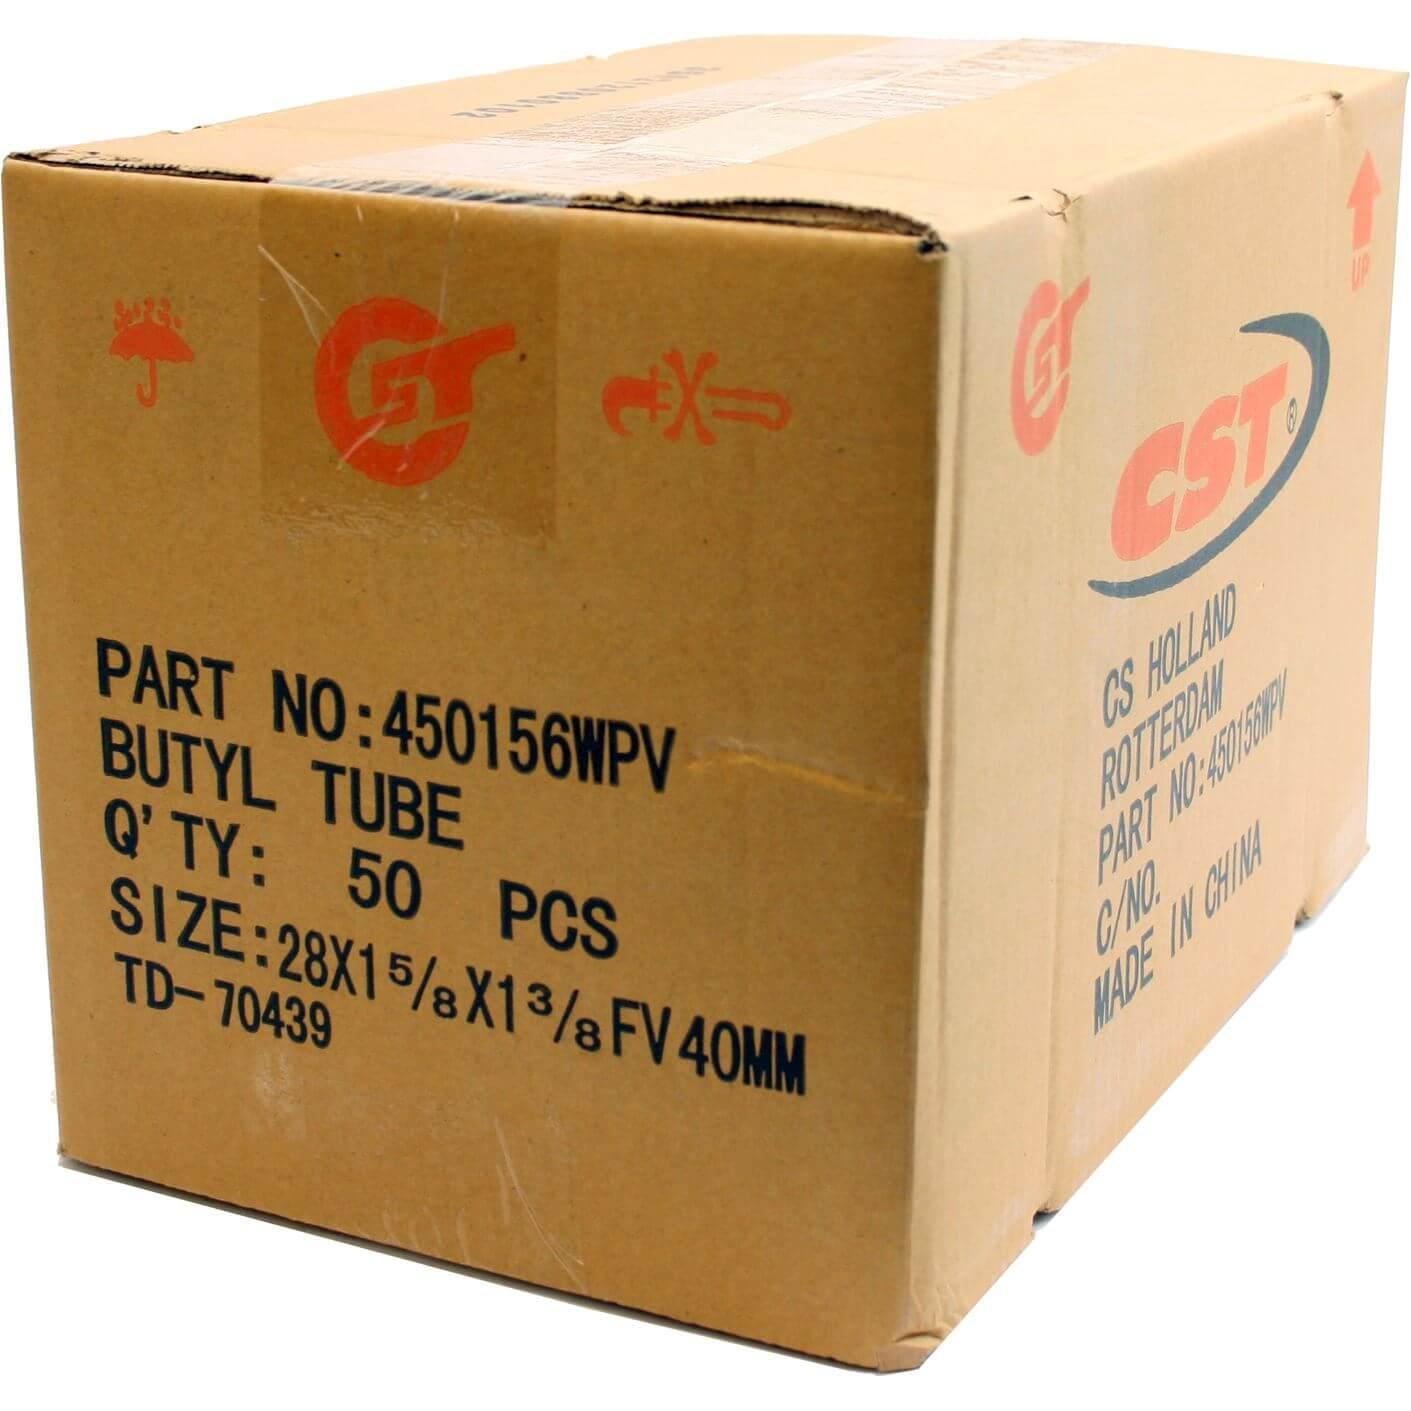 CST Bnb 28 X 1 5/8 X 1 3/8 Fv 40mm WP (50)